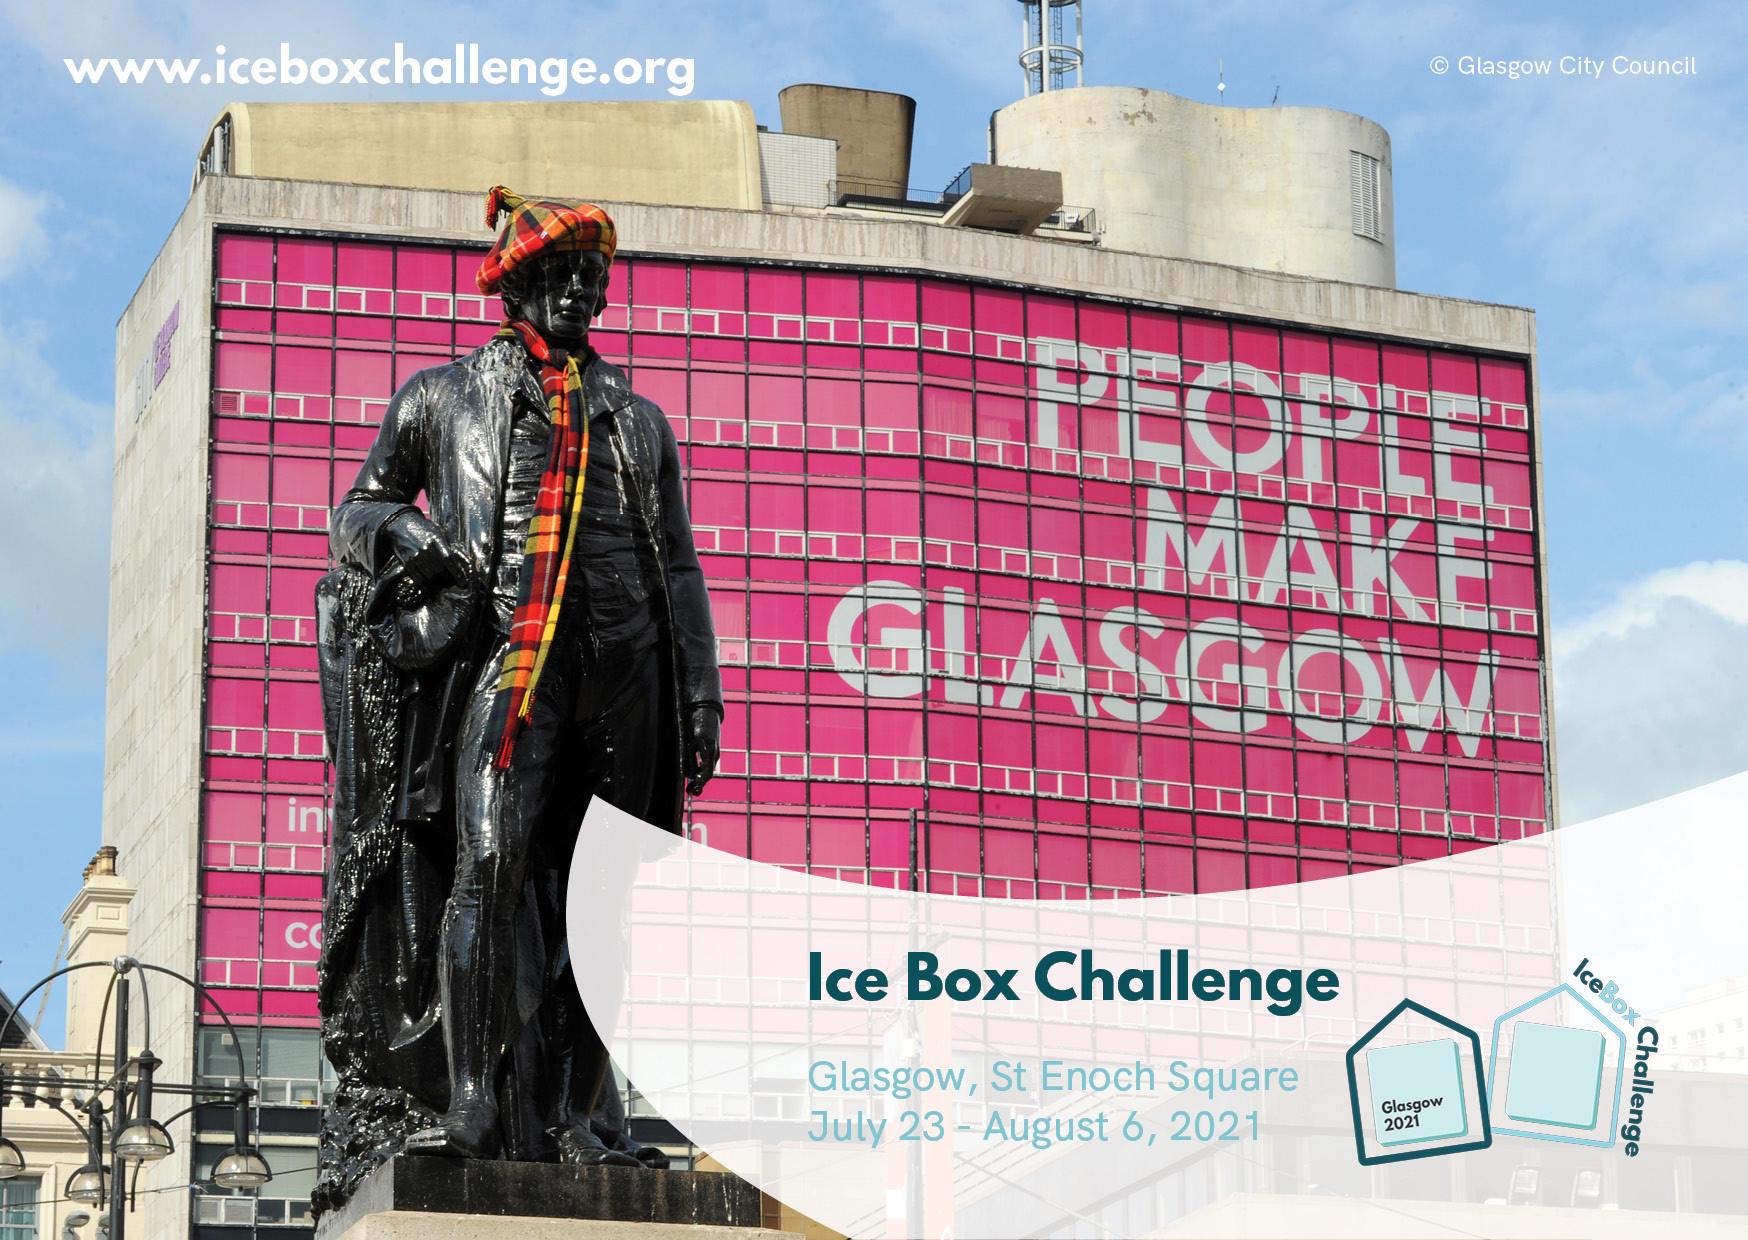 Ice Box Challenge Glasgow